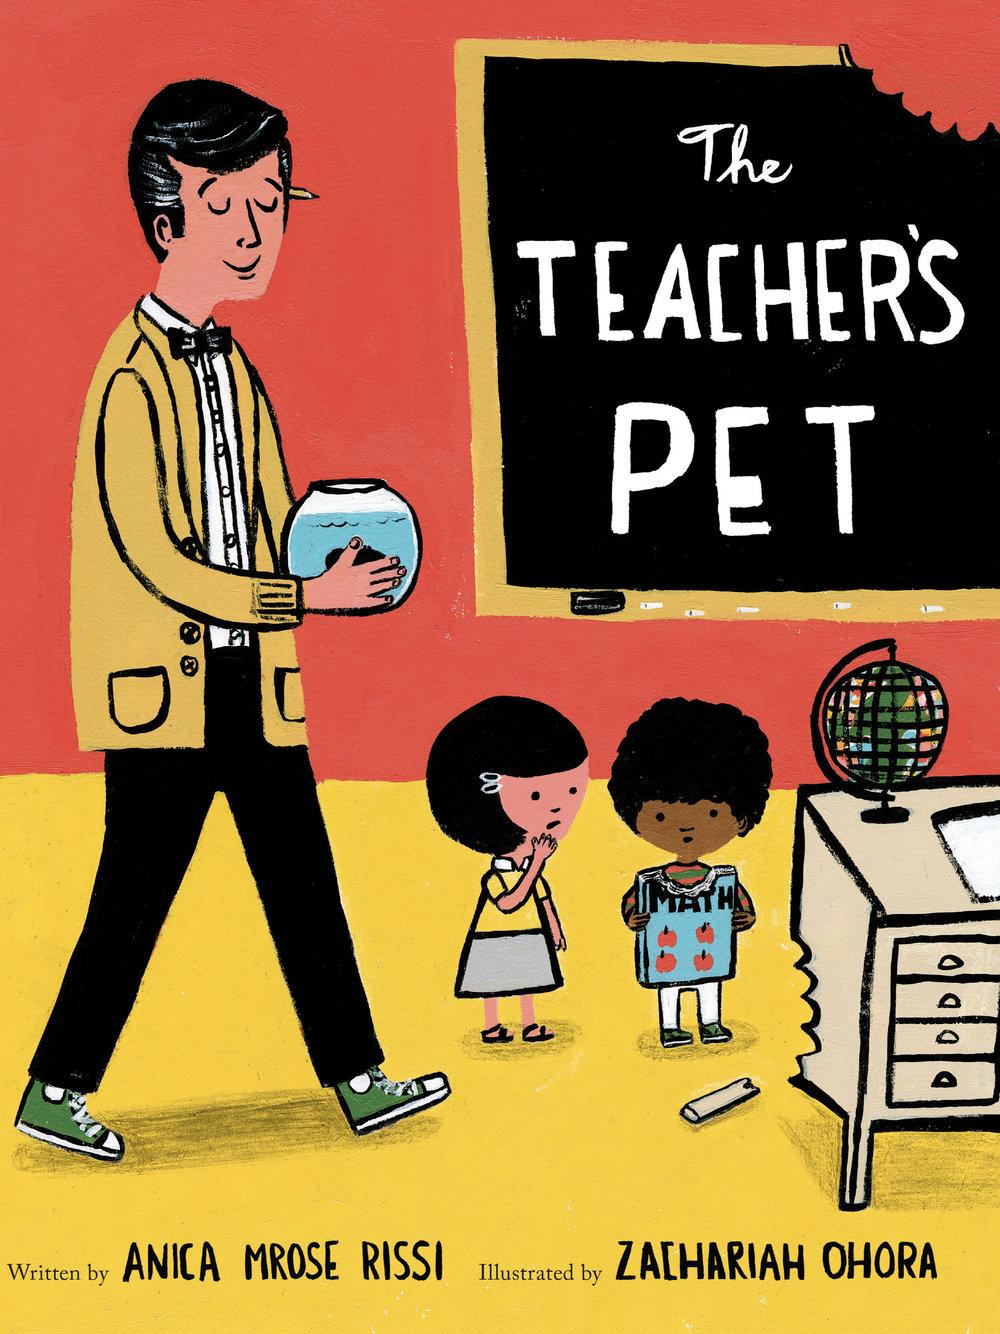 teacherspetcover.jpg